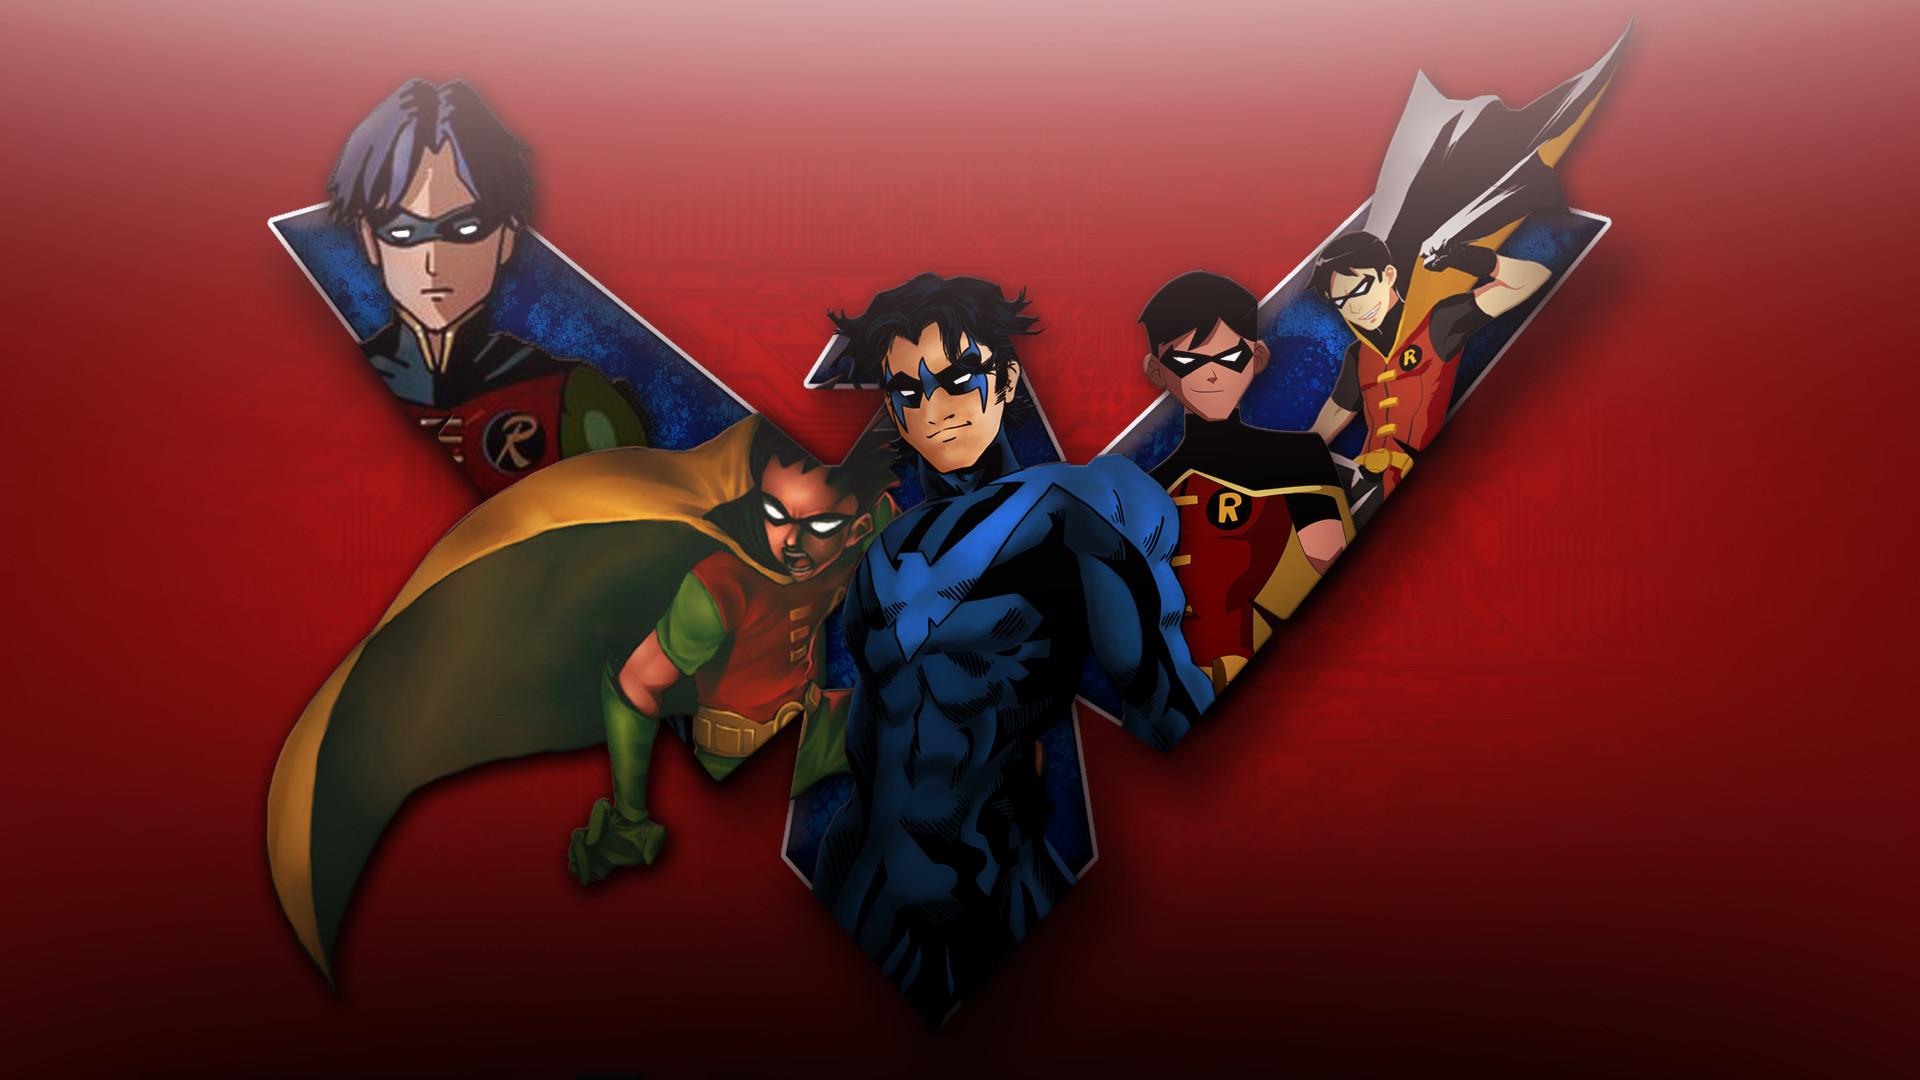 Young Justice Robin Dick Grayson Wallpaper by FeitanPainPacker on … |  Download Wallpaper | Pinterest | Young justice and Wallpaper